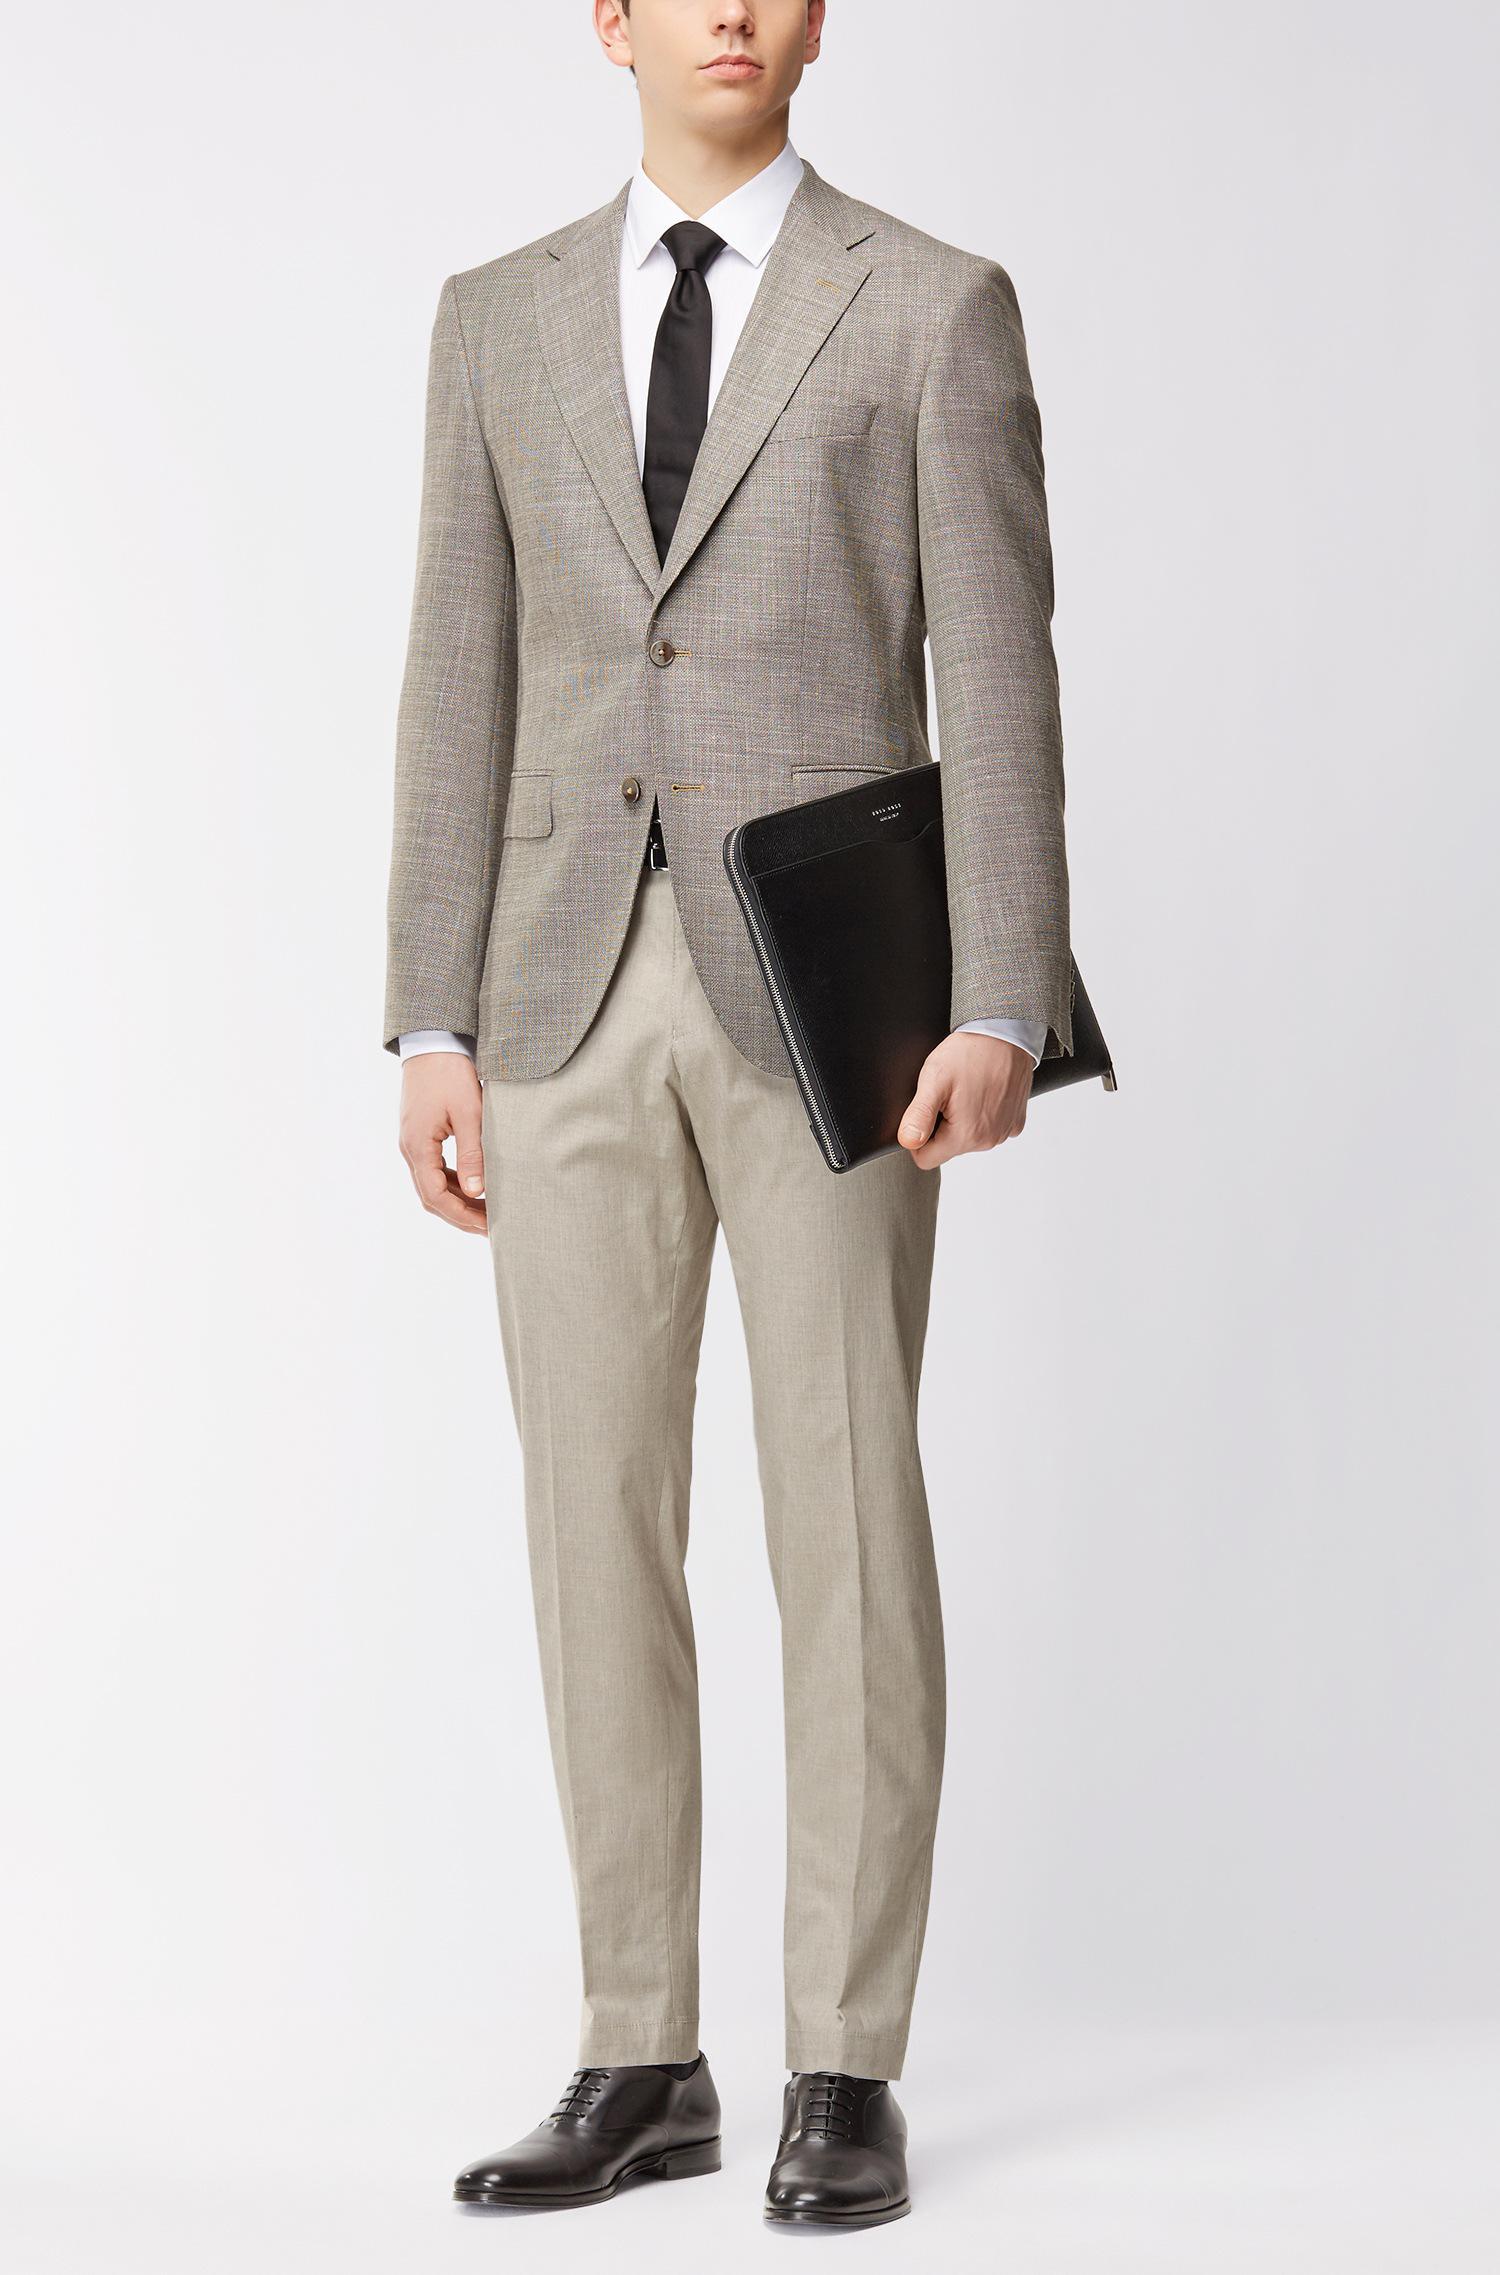 6a46cf26 Lyst - Boss Heathered Stretch Cotton Dress Pant, Slim Fit | Gaetano ...